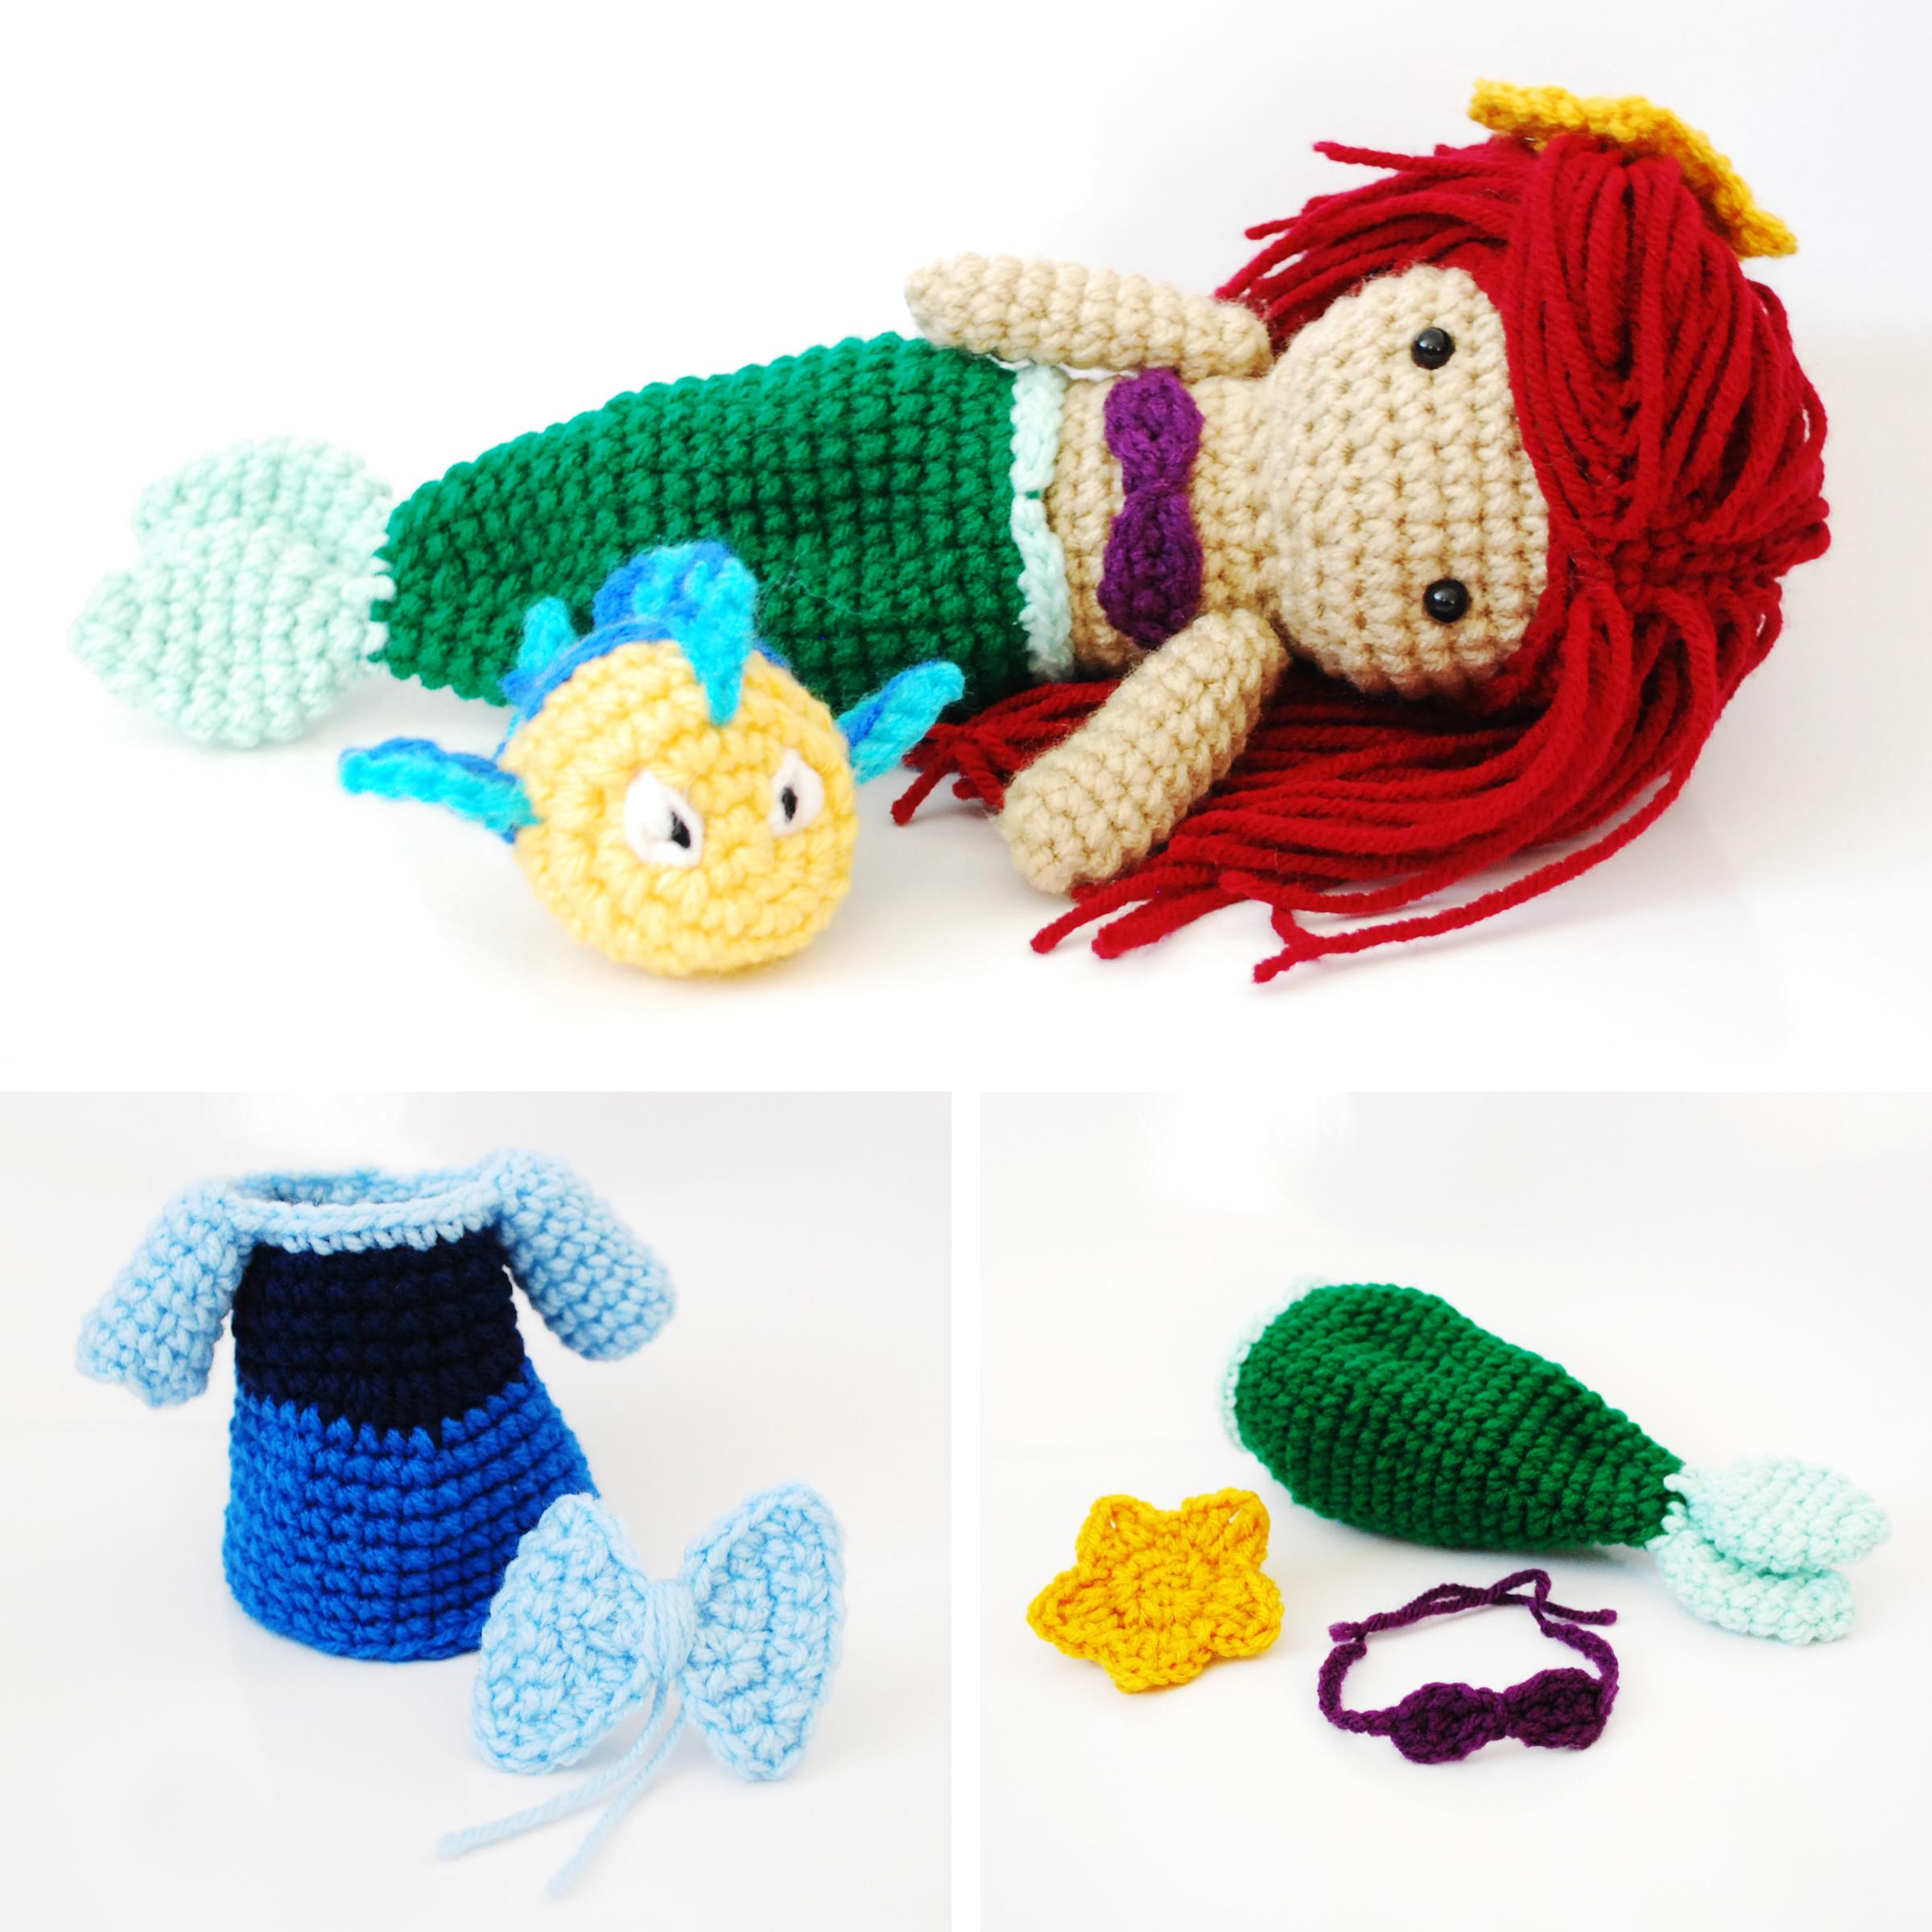 Crochet Amigurumi Collection : Ariel, The Little Mermaid. Crochet Amigurumi Doll ...